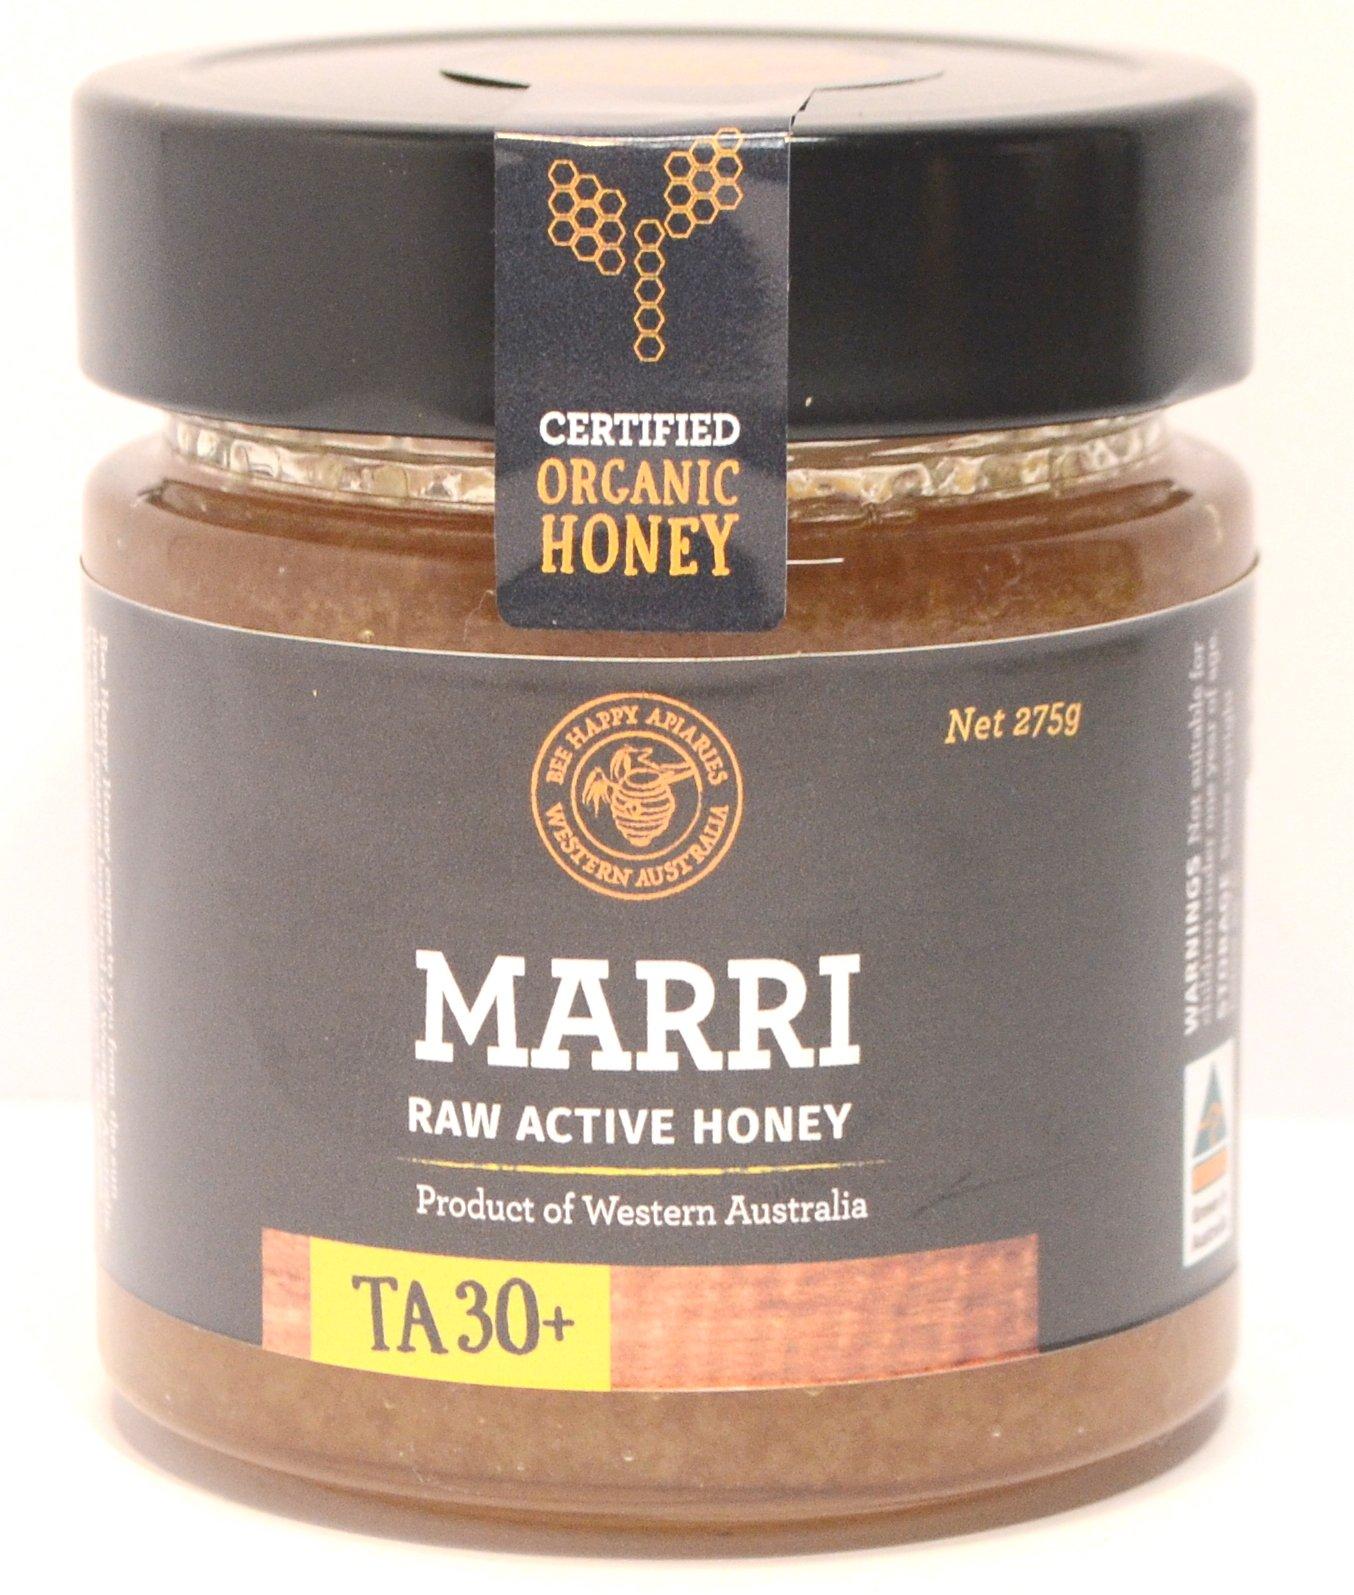 Organic Marri Honey TA 30+ 275g Jar